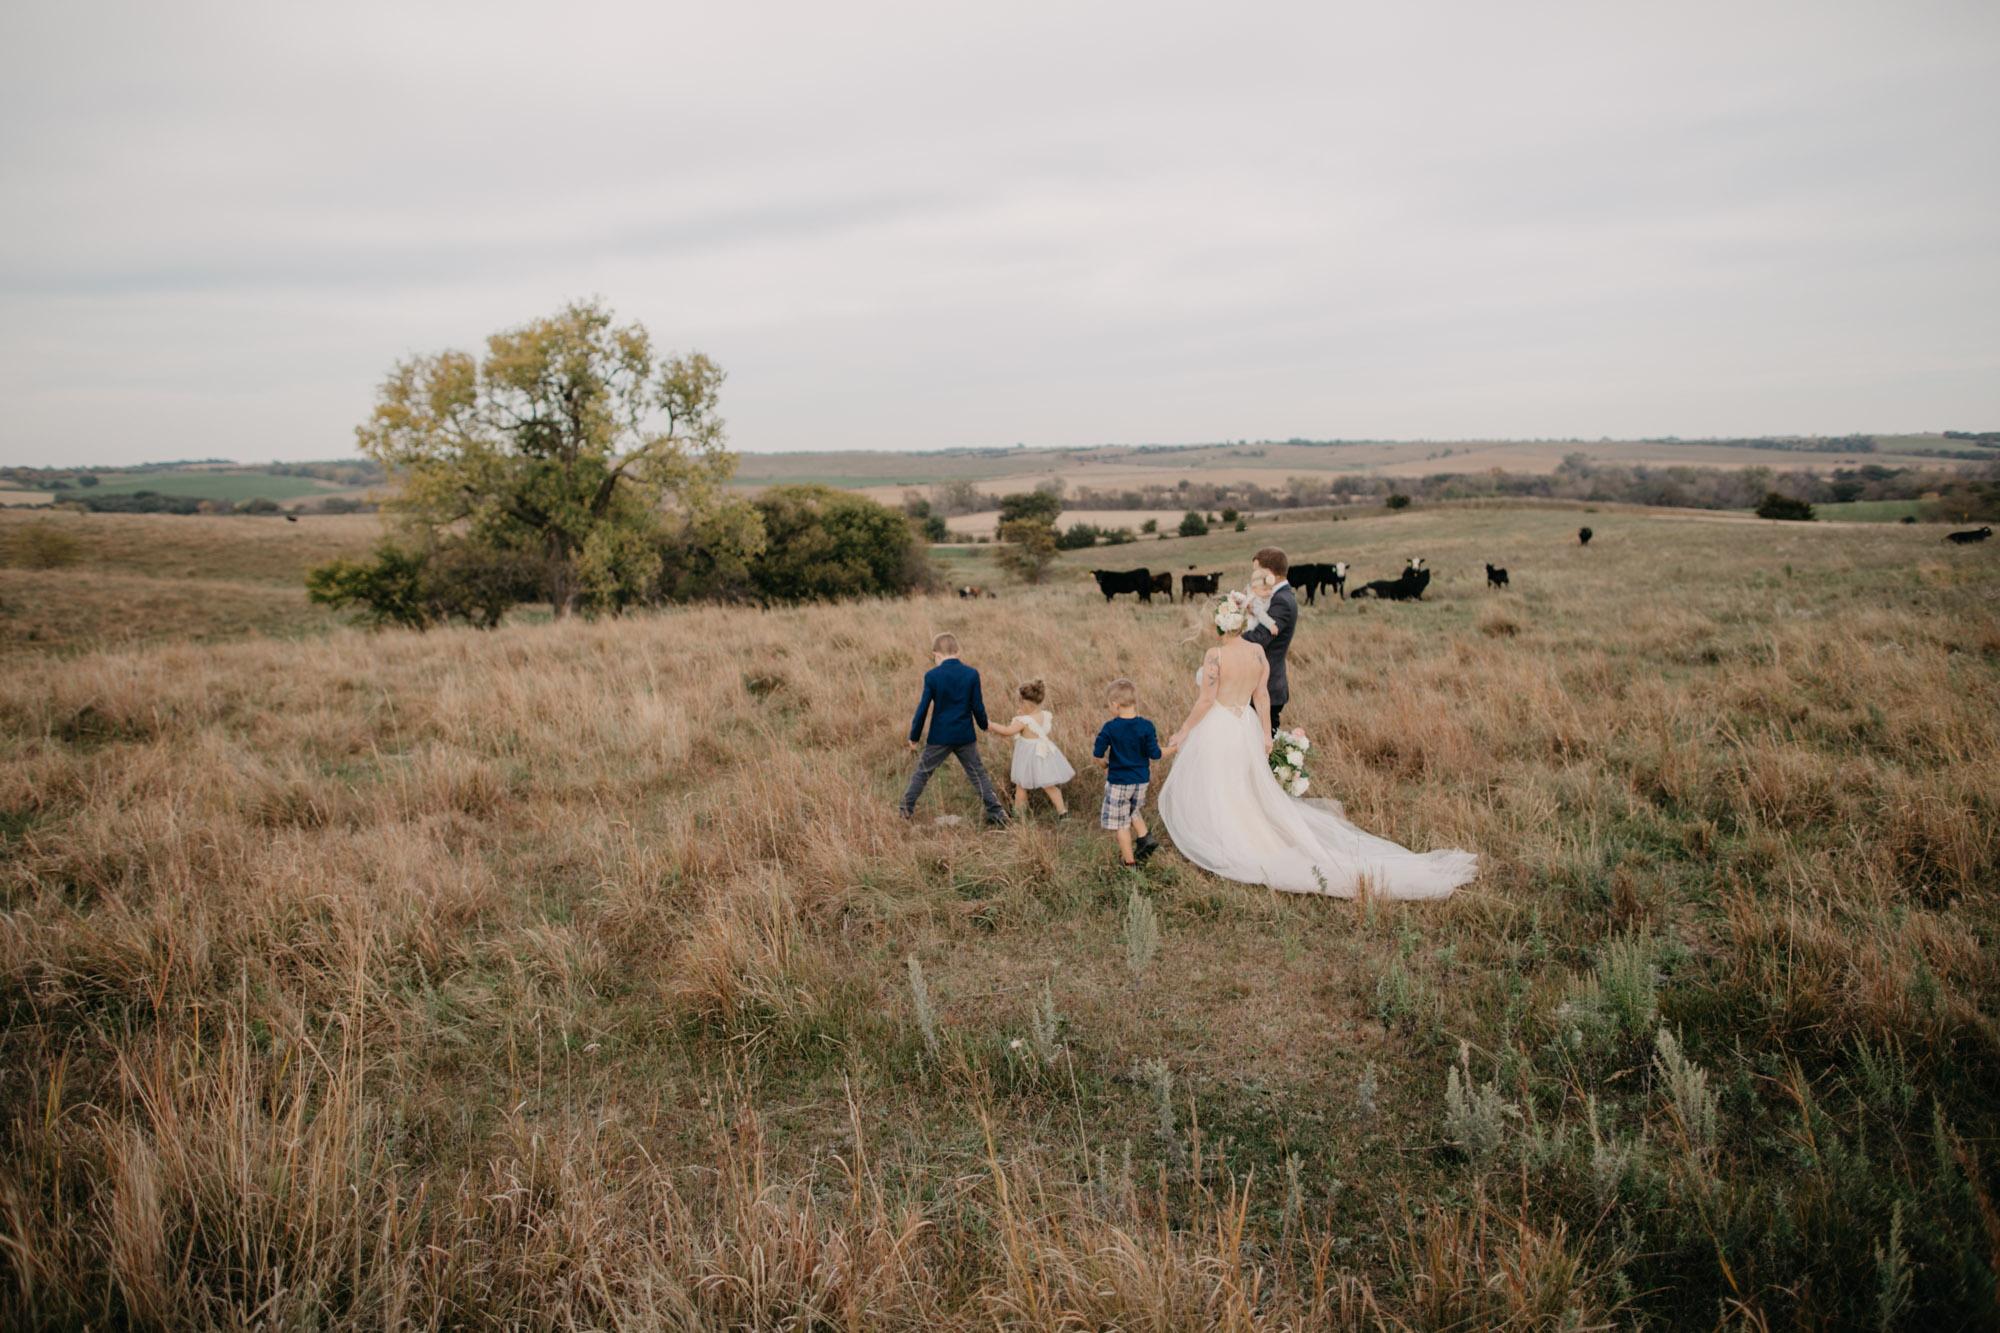 omaha-wedding-photographer-meghan-time-25.jpg